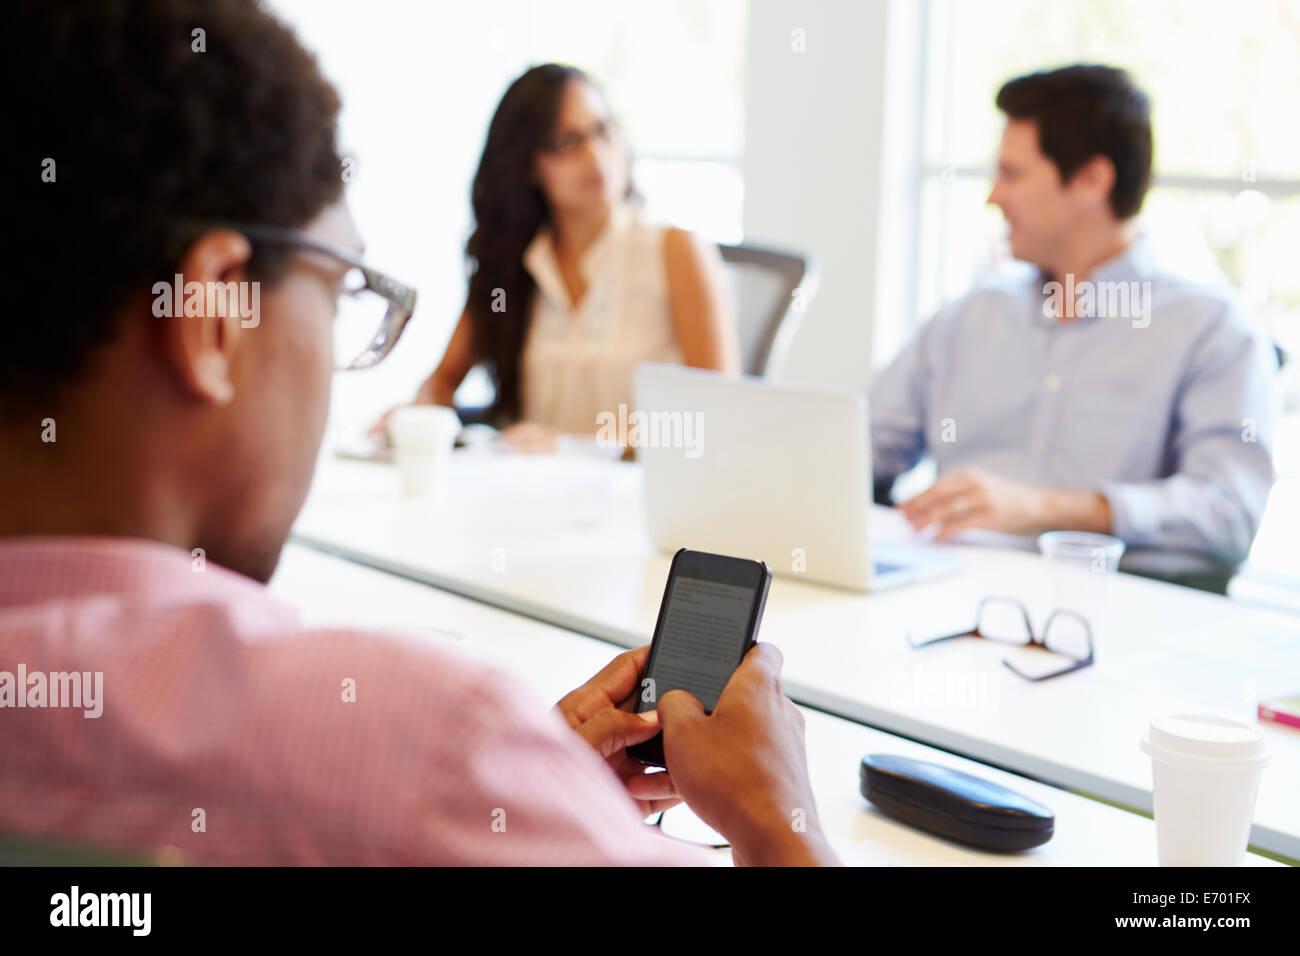 Designer Using Mobile Phone During Meeting - Stock Image